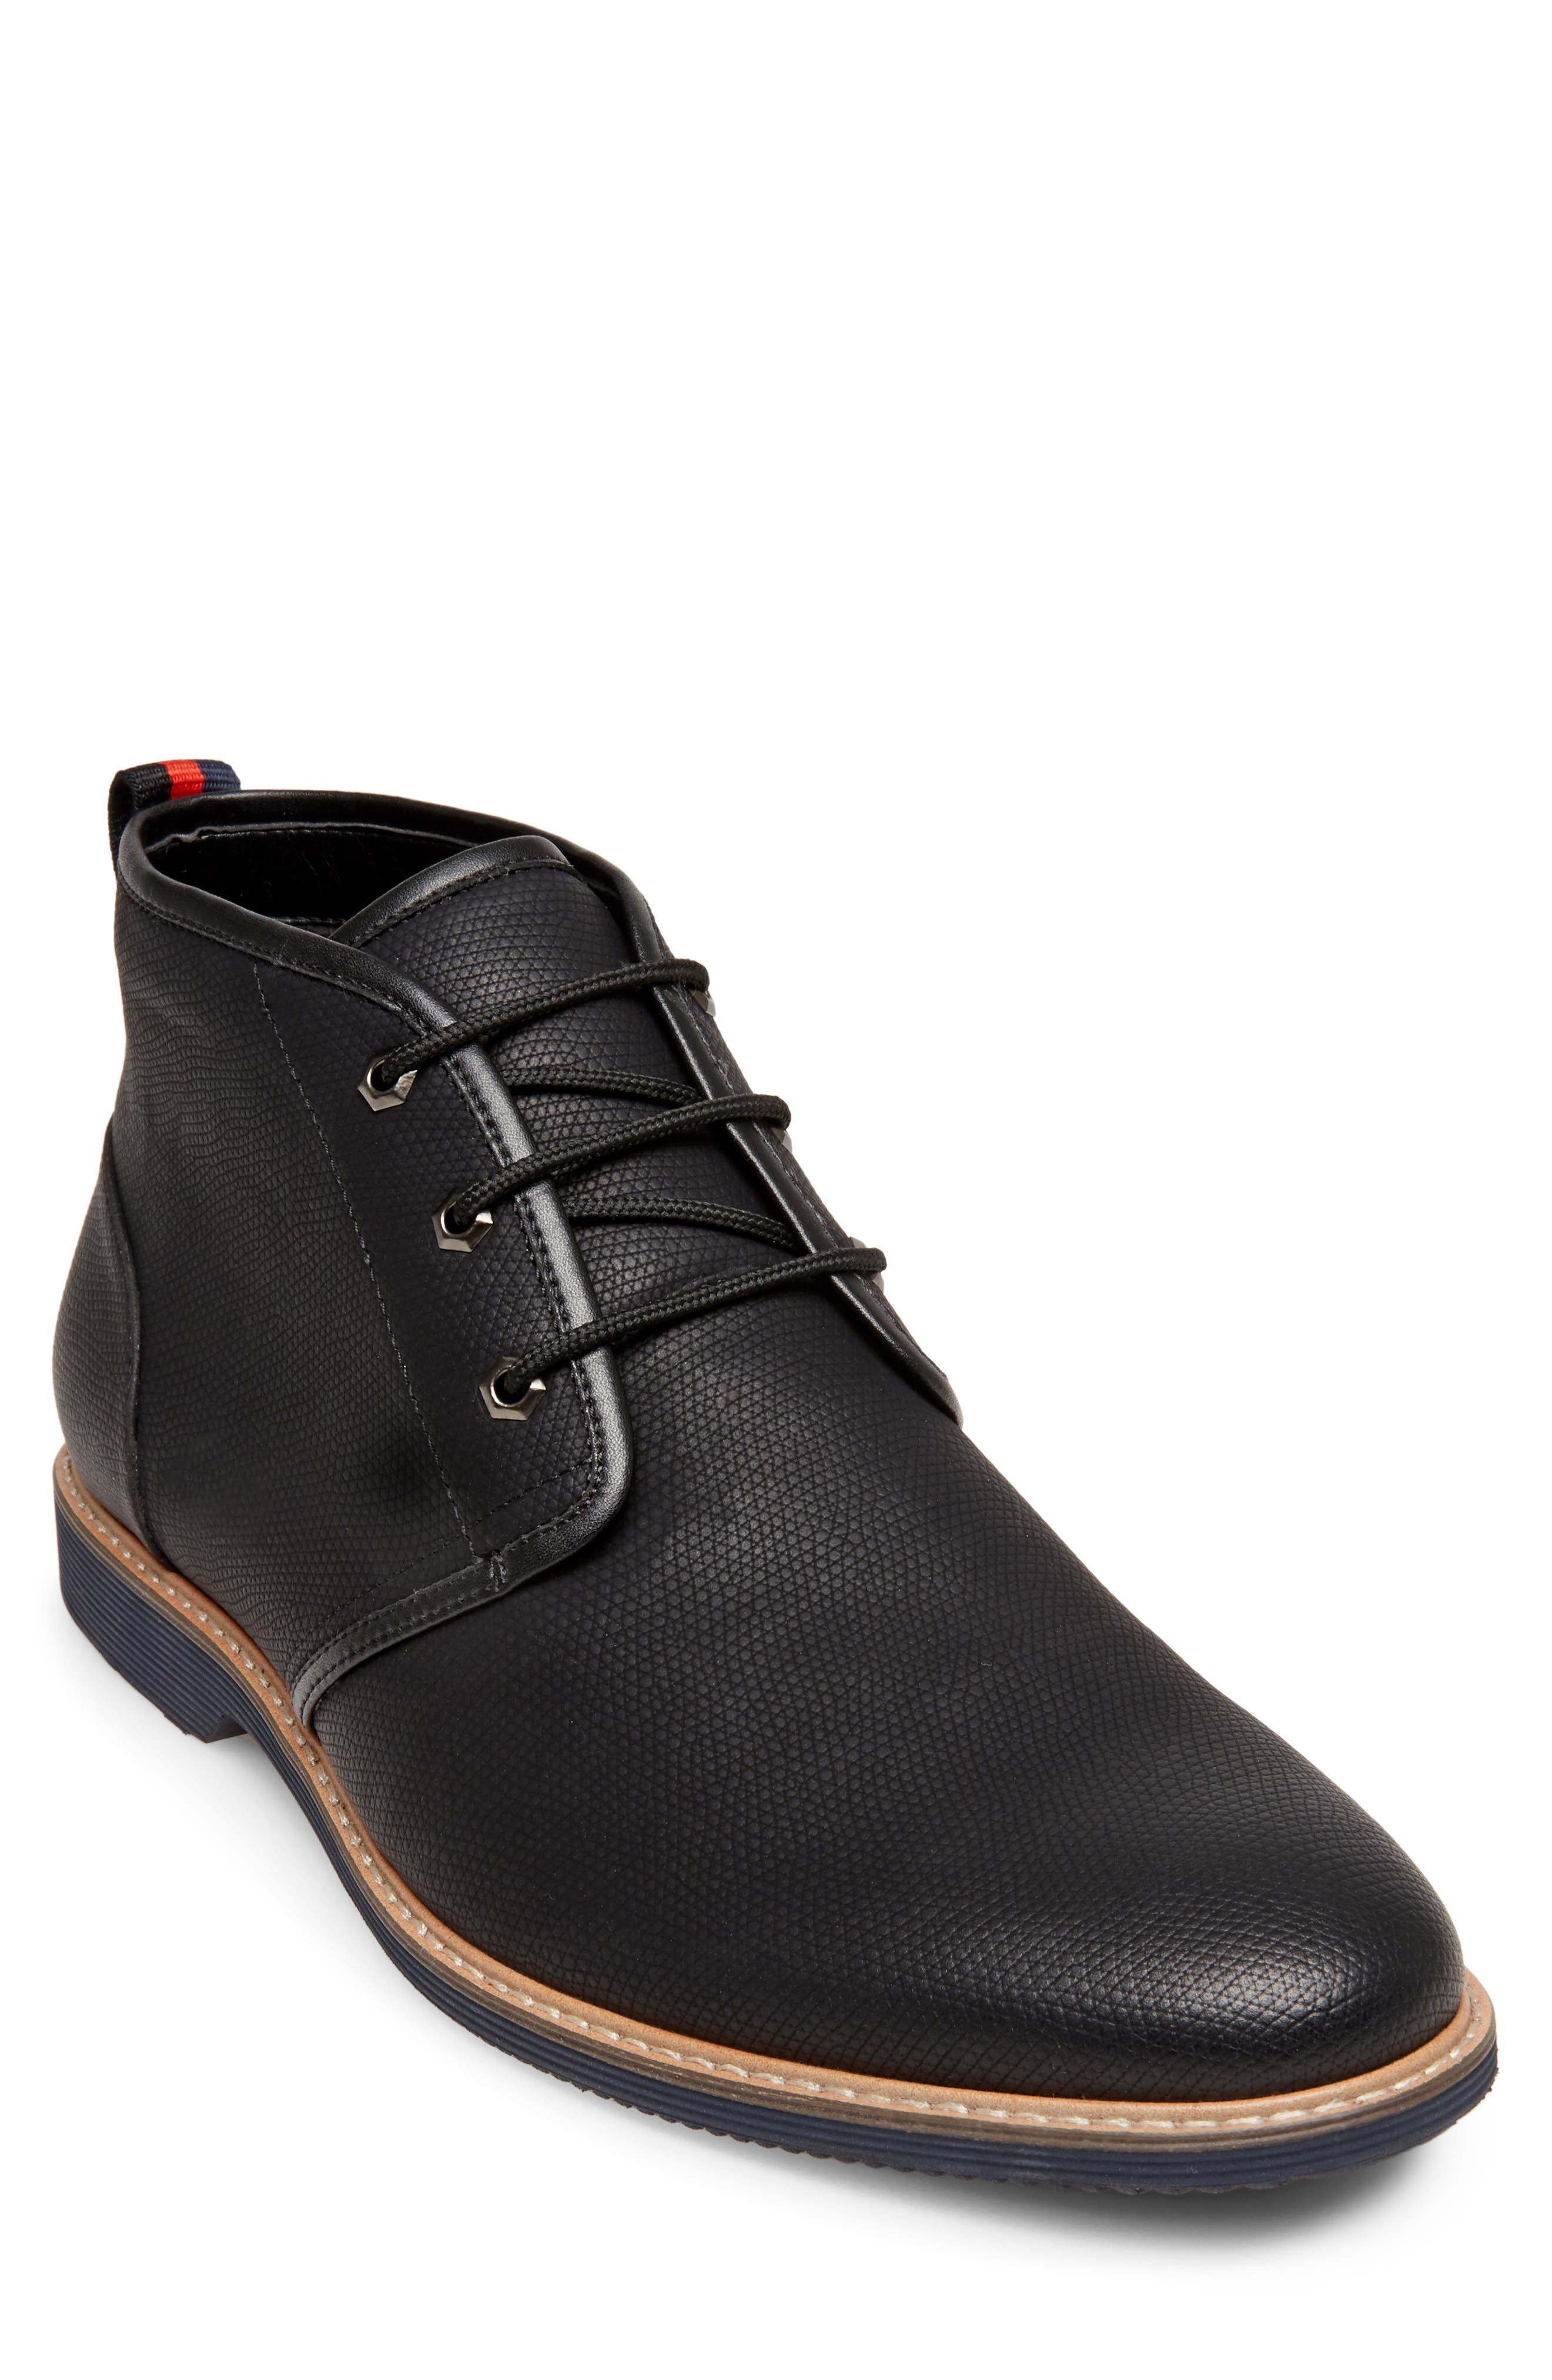 STEVE MADDEN Nurture Plain Toe Boot, Main, color, 002